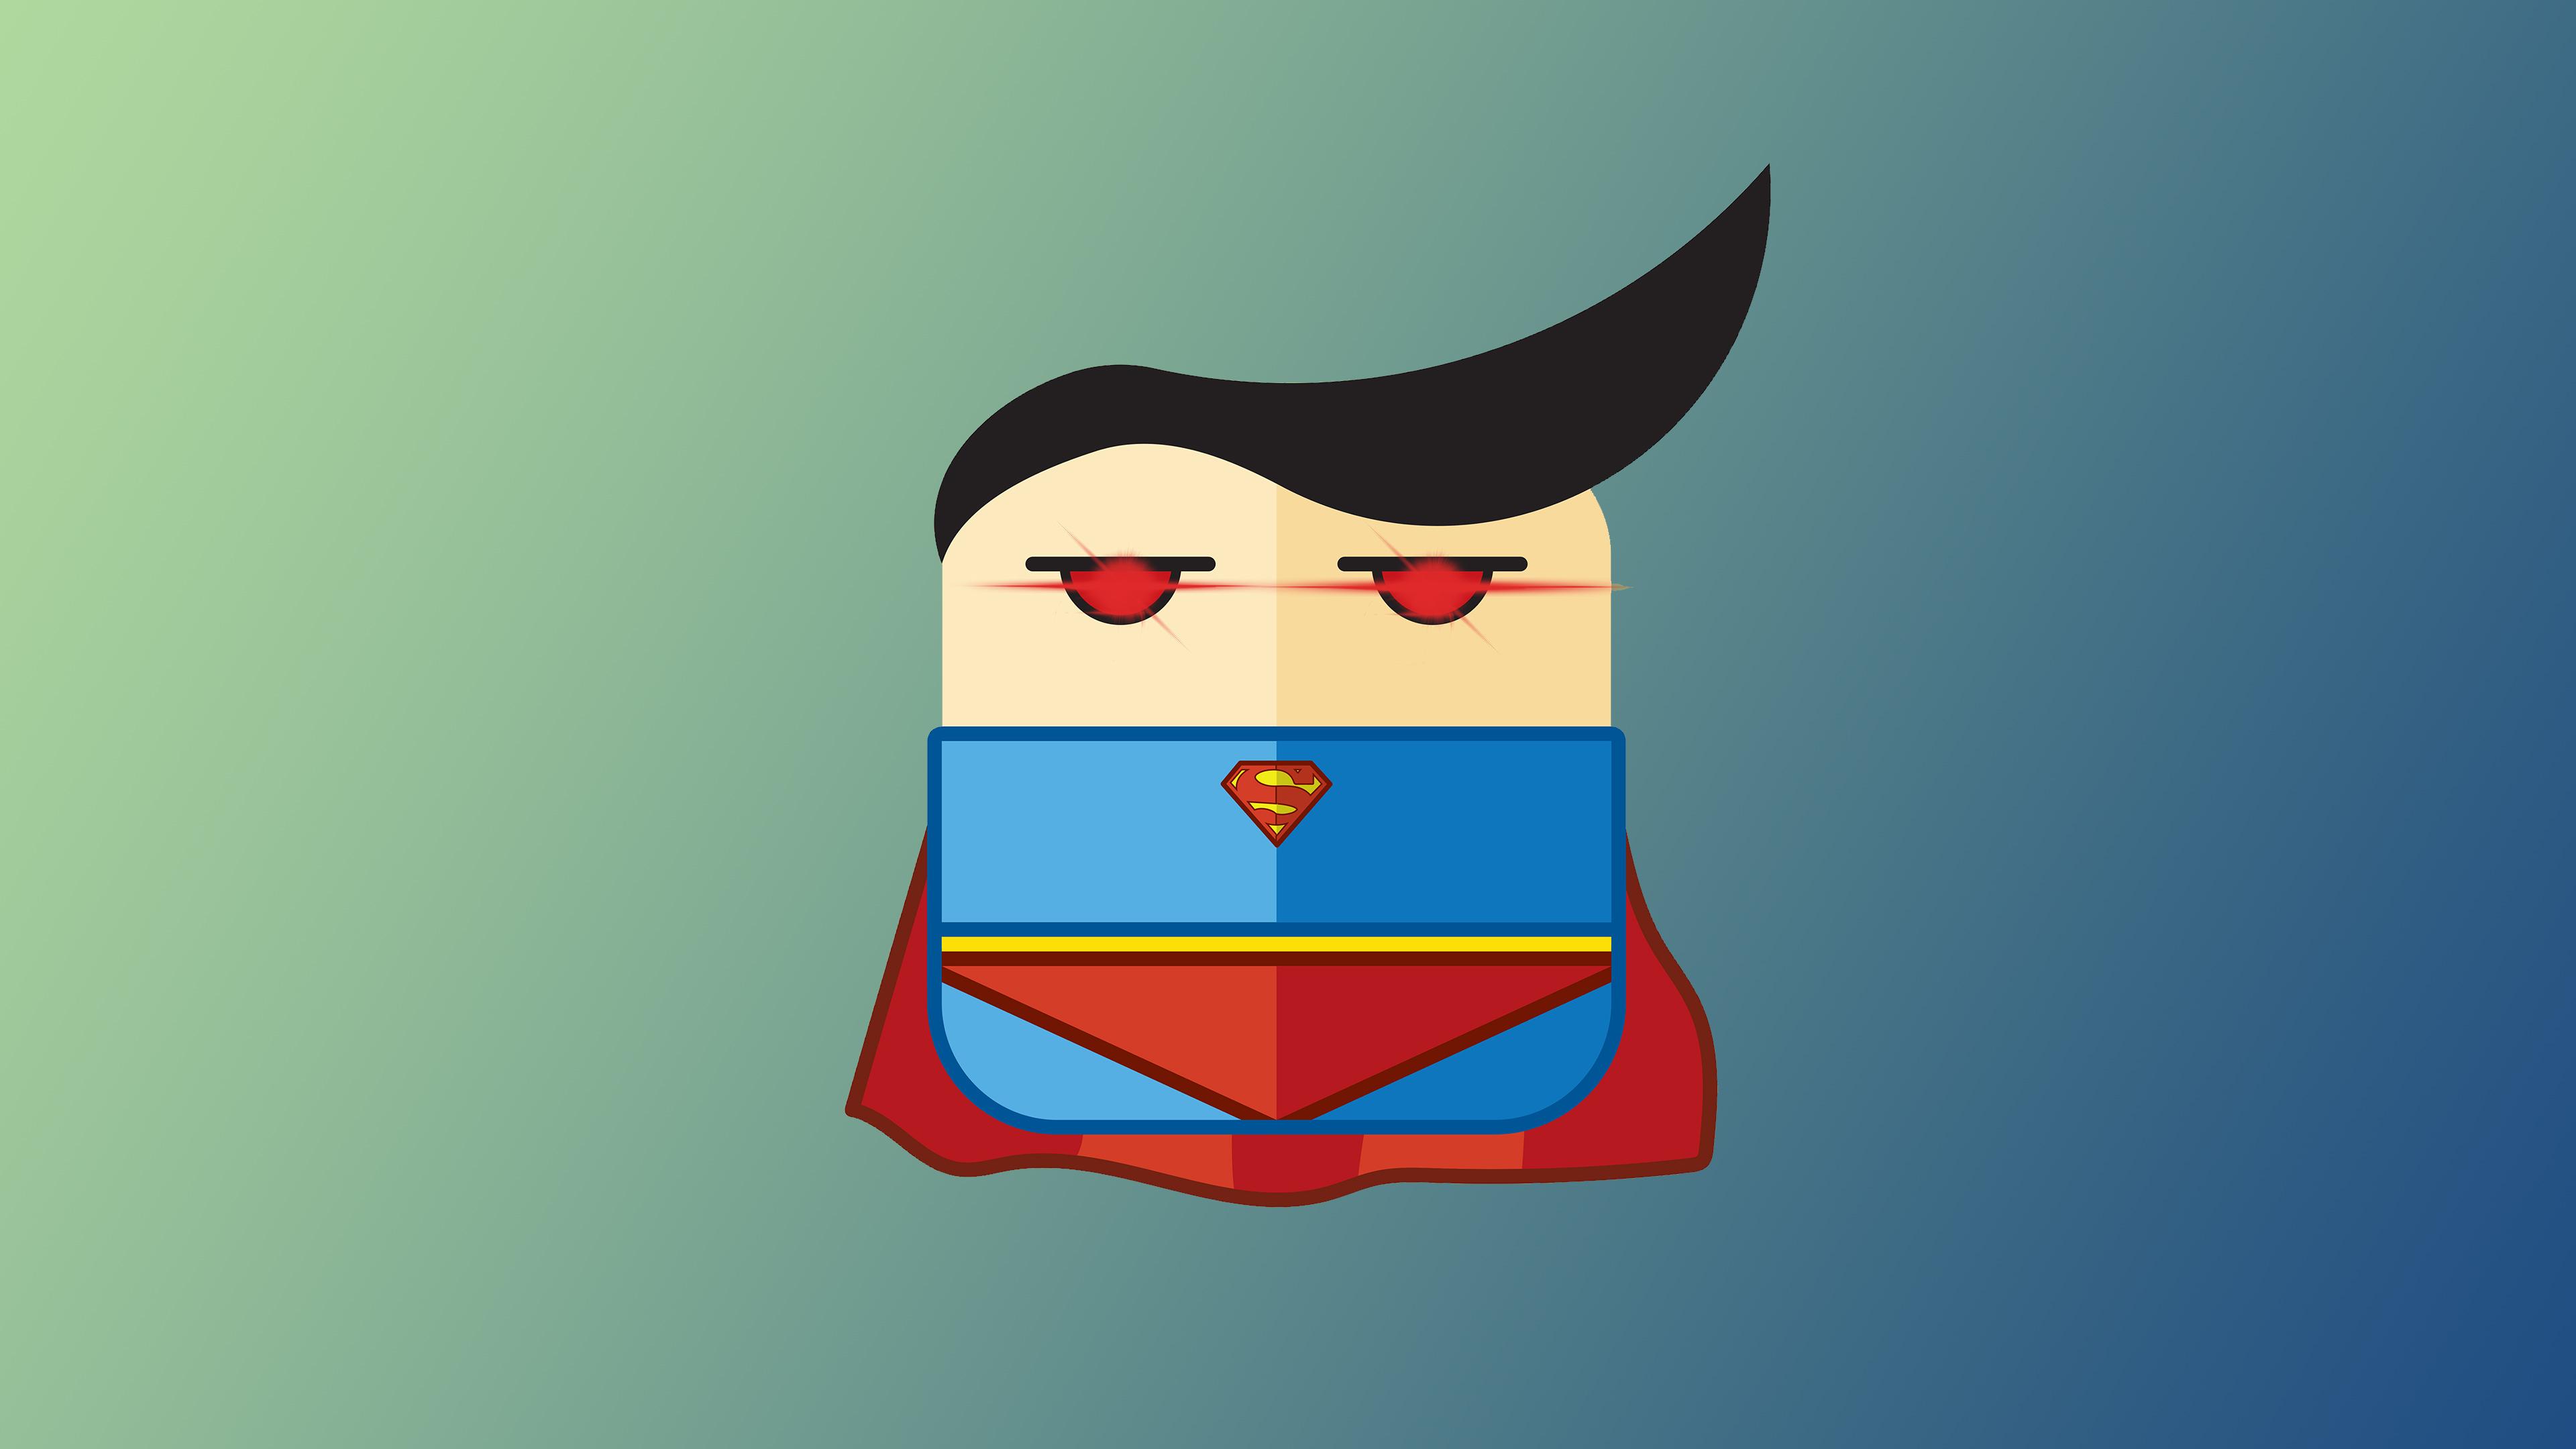 superman minimalist 4k 1553071118 - Superman Minimalist 4k - superman wallpapers, superheroes wallpapers, minimalist wallpapers, minimalism wallpapers, hd-wallpapers, digital art wallpapers, behance wallpapers, artwork wallpapers, artist wallpapers, 4k-wallpapers